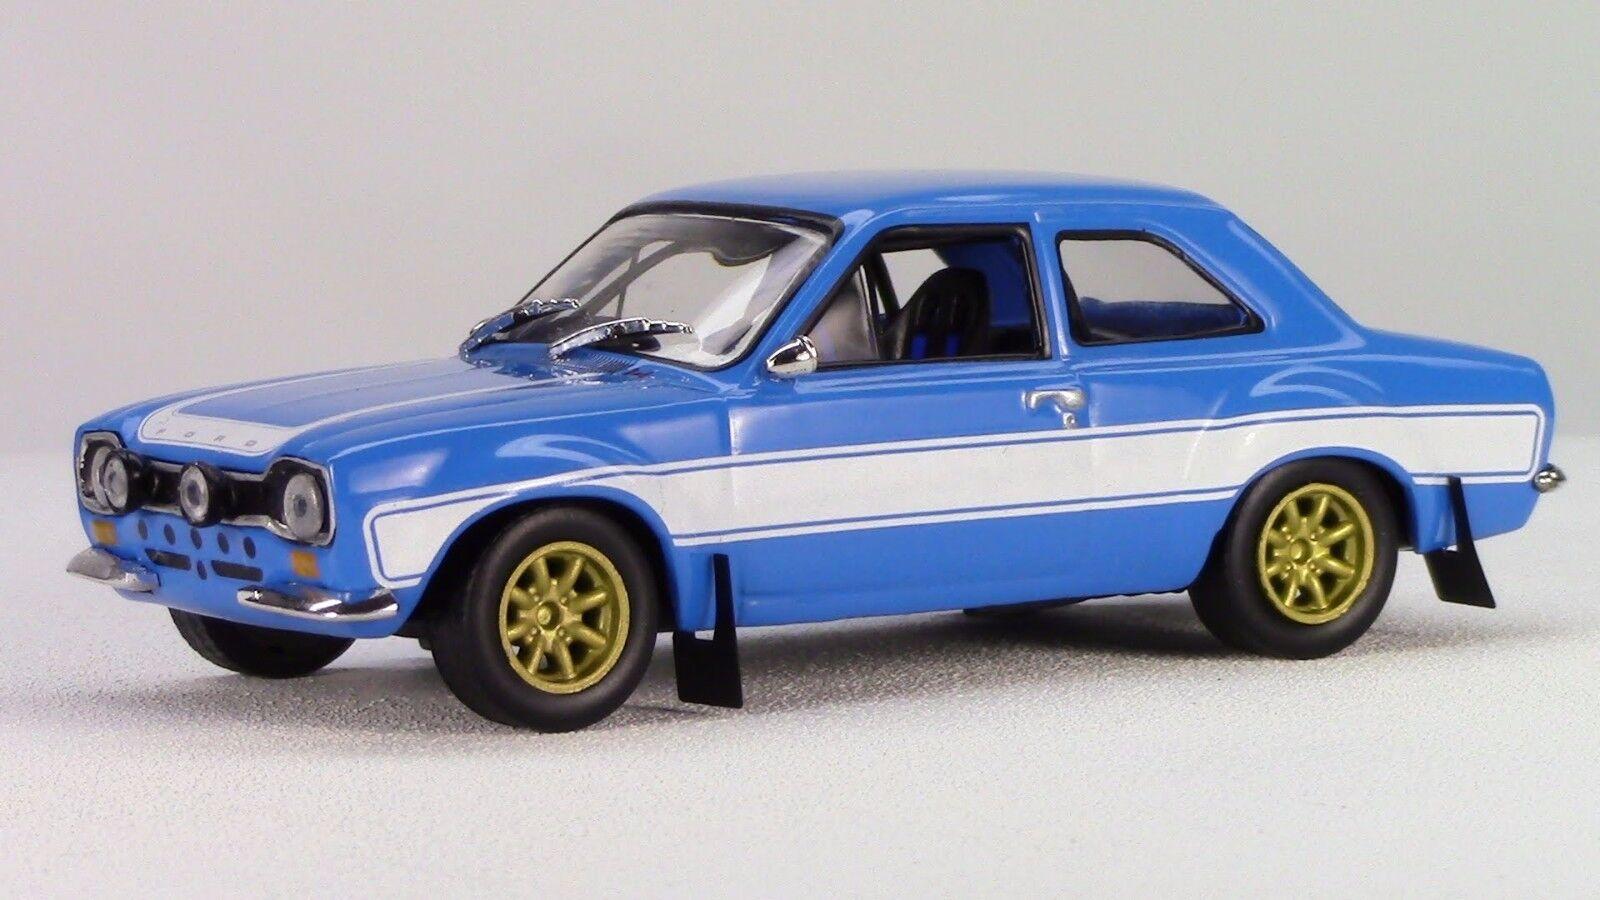 Grünlight Ford Escort RS2000 Mkk 1974 Brian's Auto Fast And Furious 19022 1 18  | Ab dem neuesten Modell